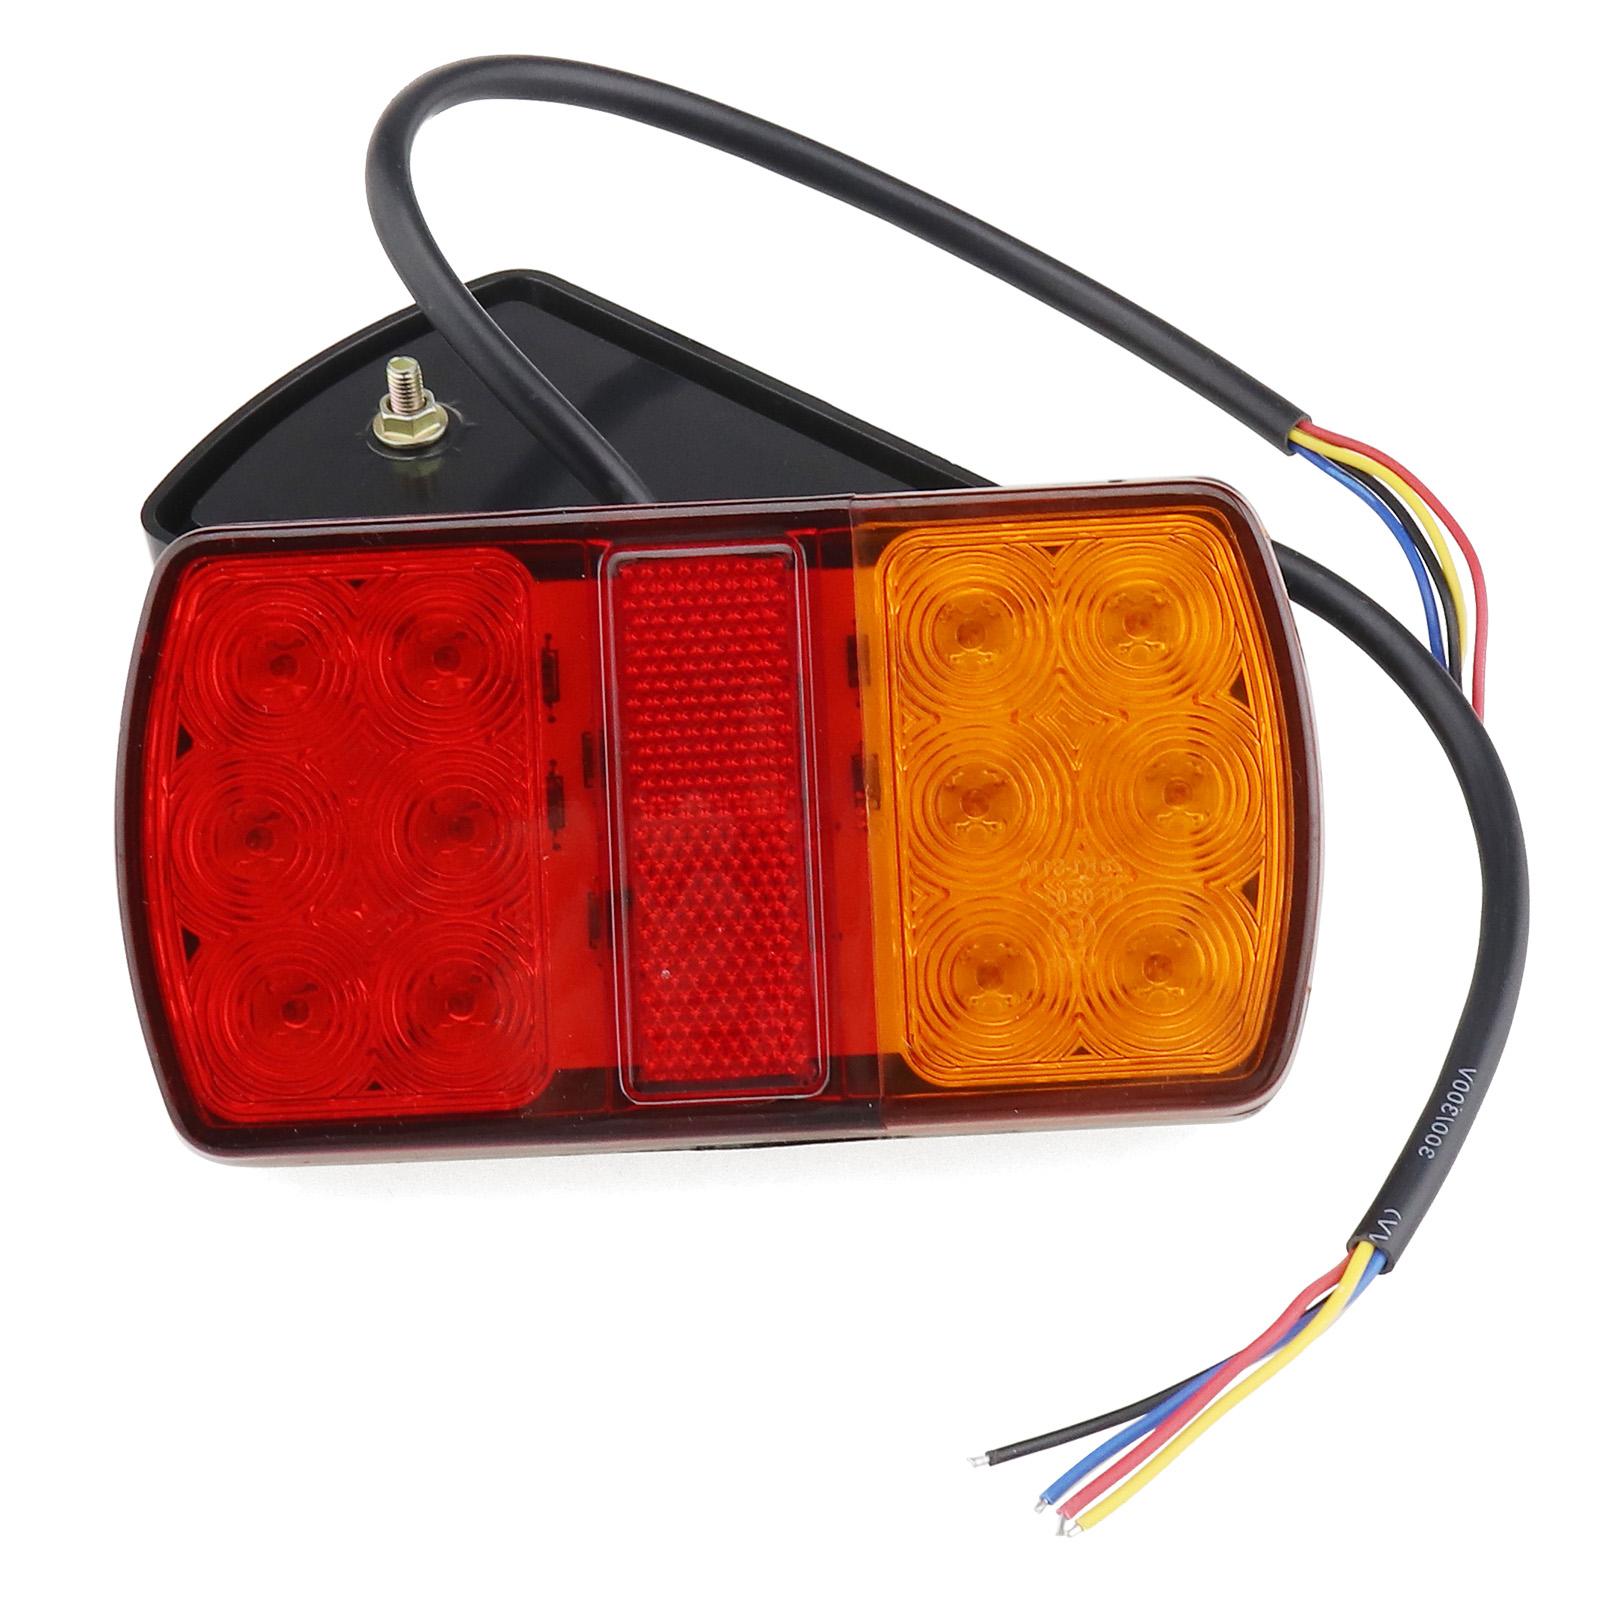 2x Rückleuchten LED Anhänger Rücklicht Heckleuchte Beleuchtung mit ...